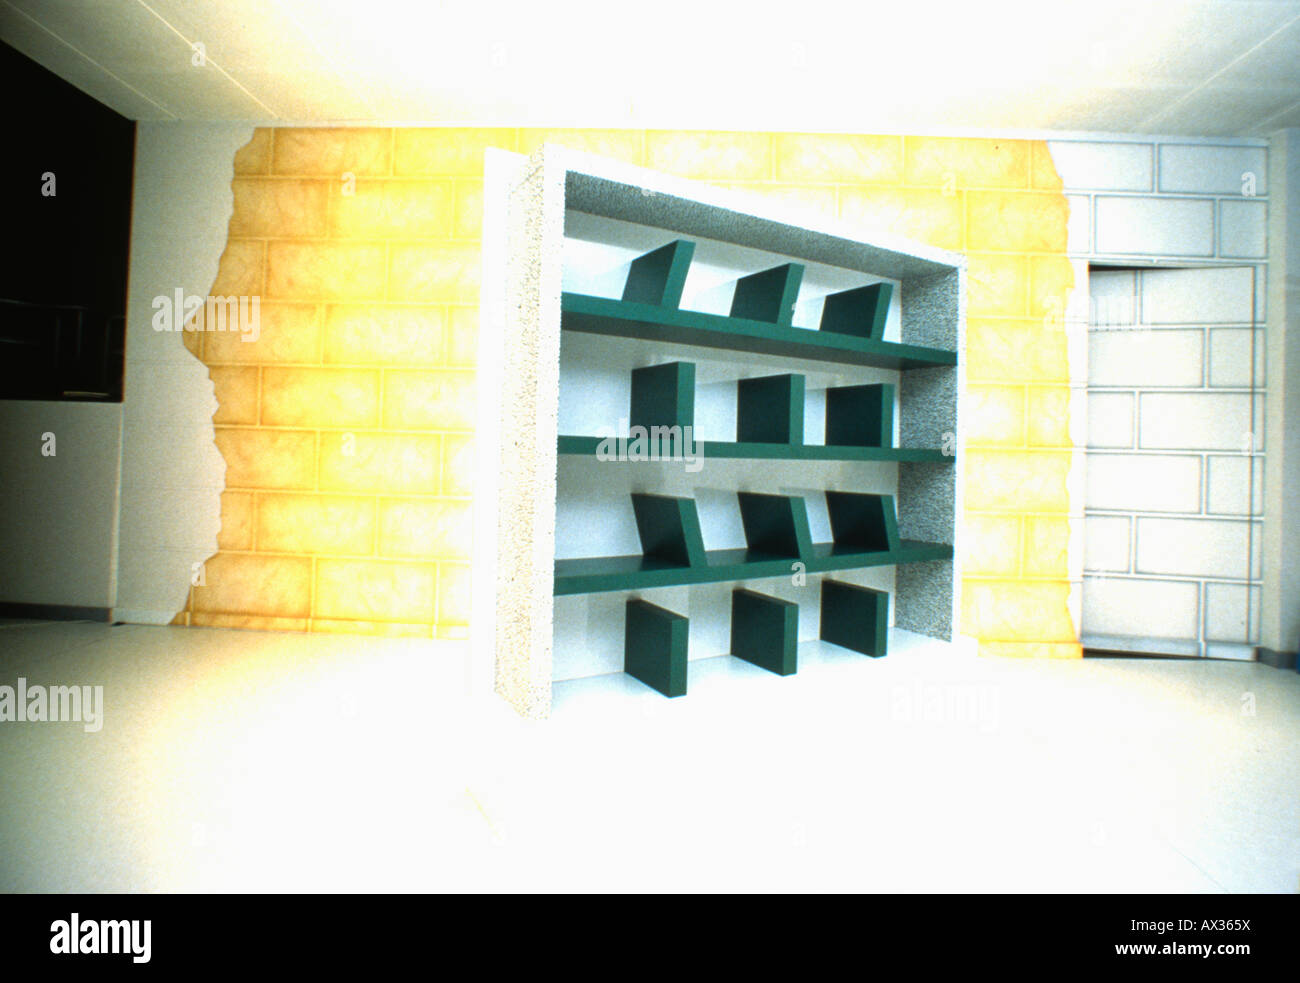 Black recessed shelves designed by Memphis - Stock Image